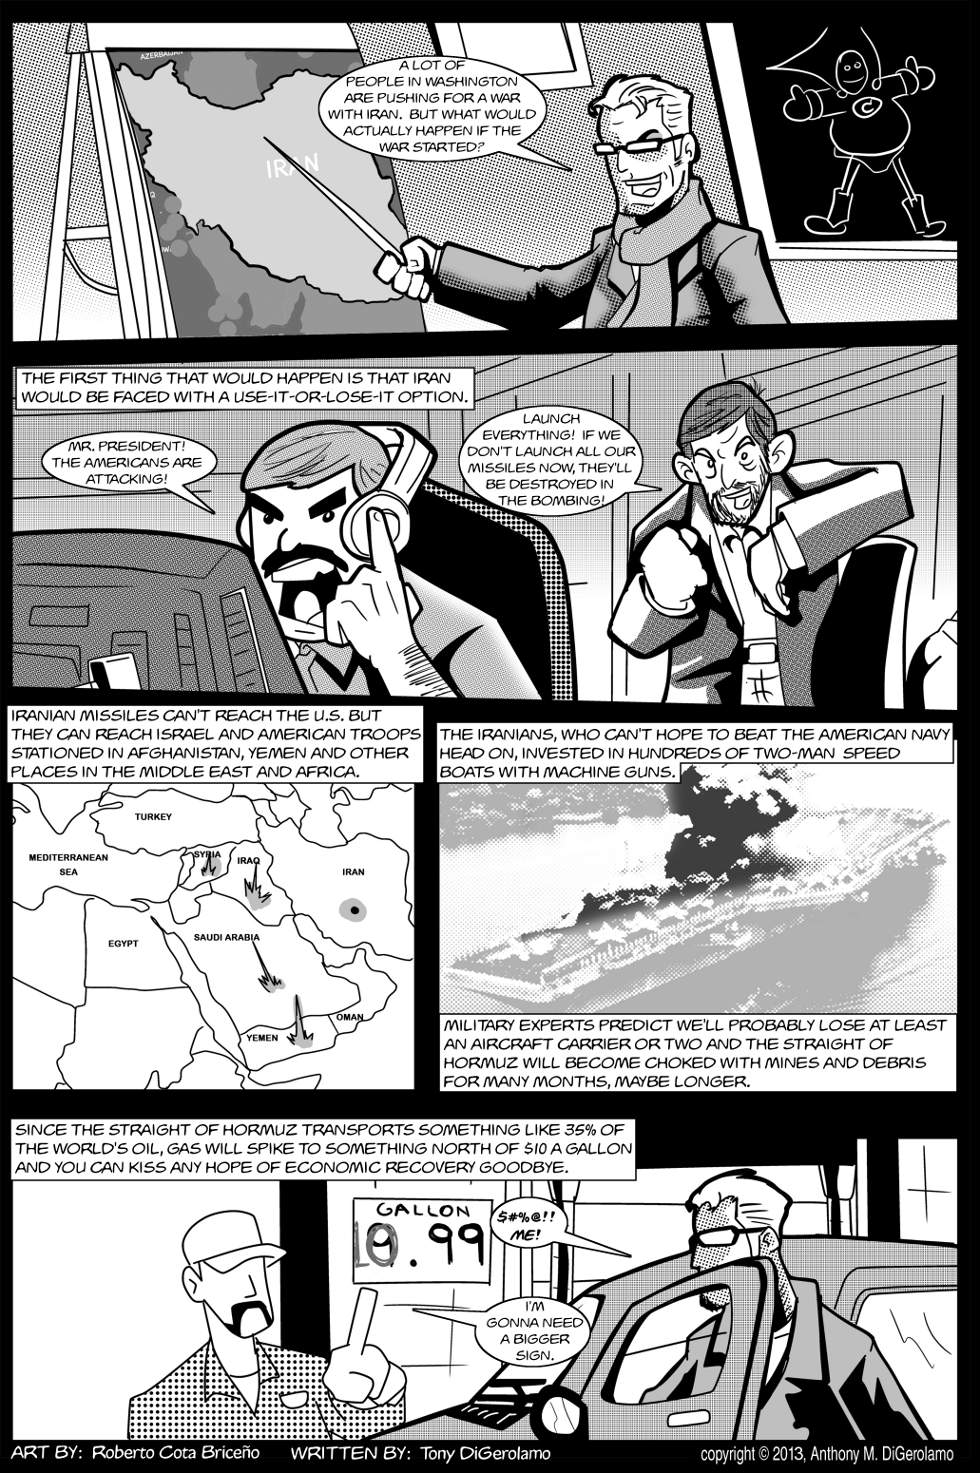 The Antiwar Comic:  Attacking Iran's a Stupid Plan